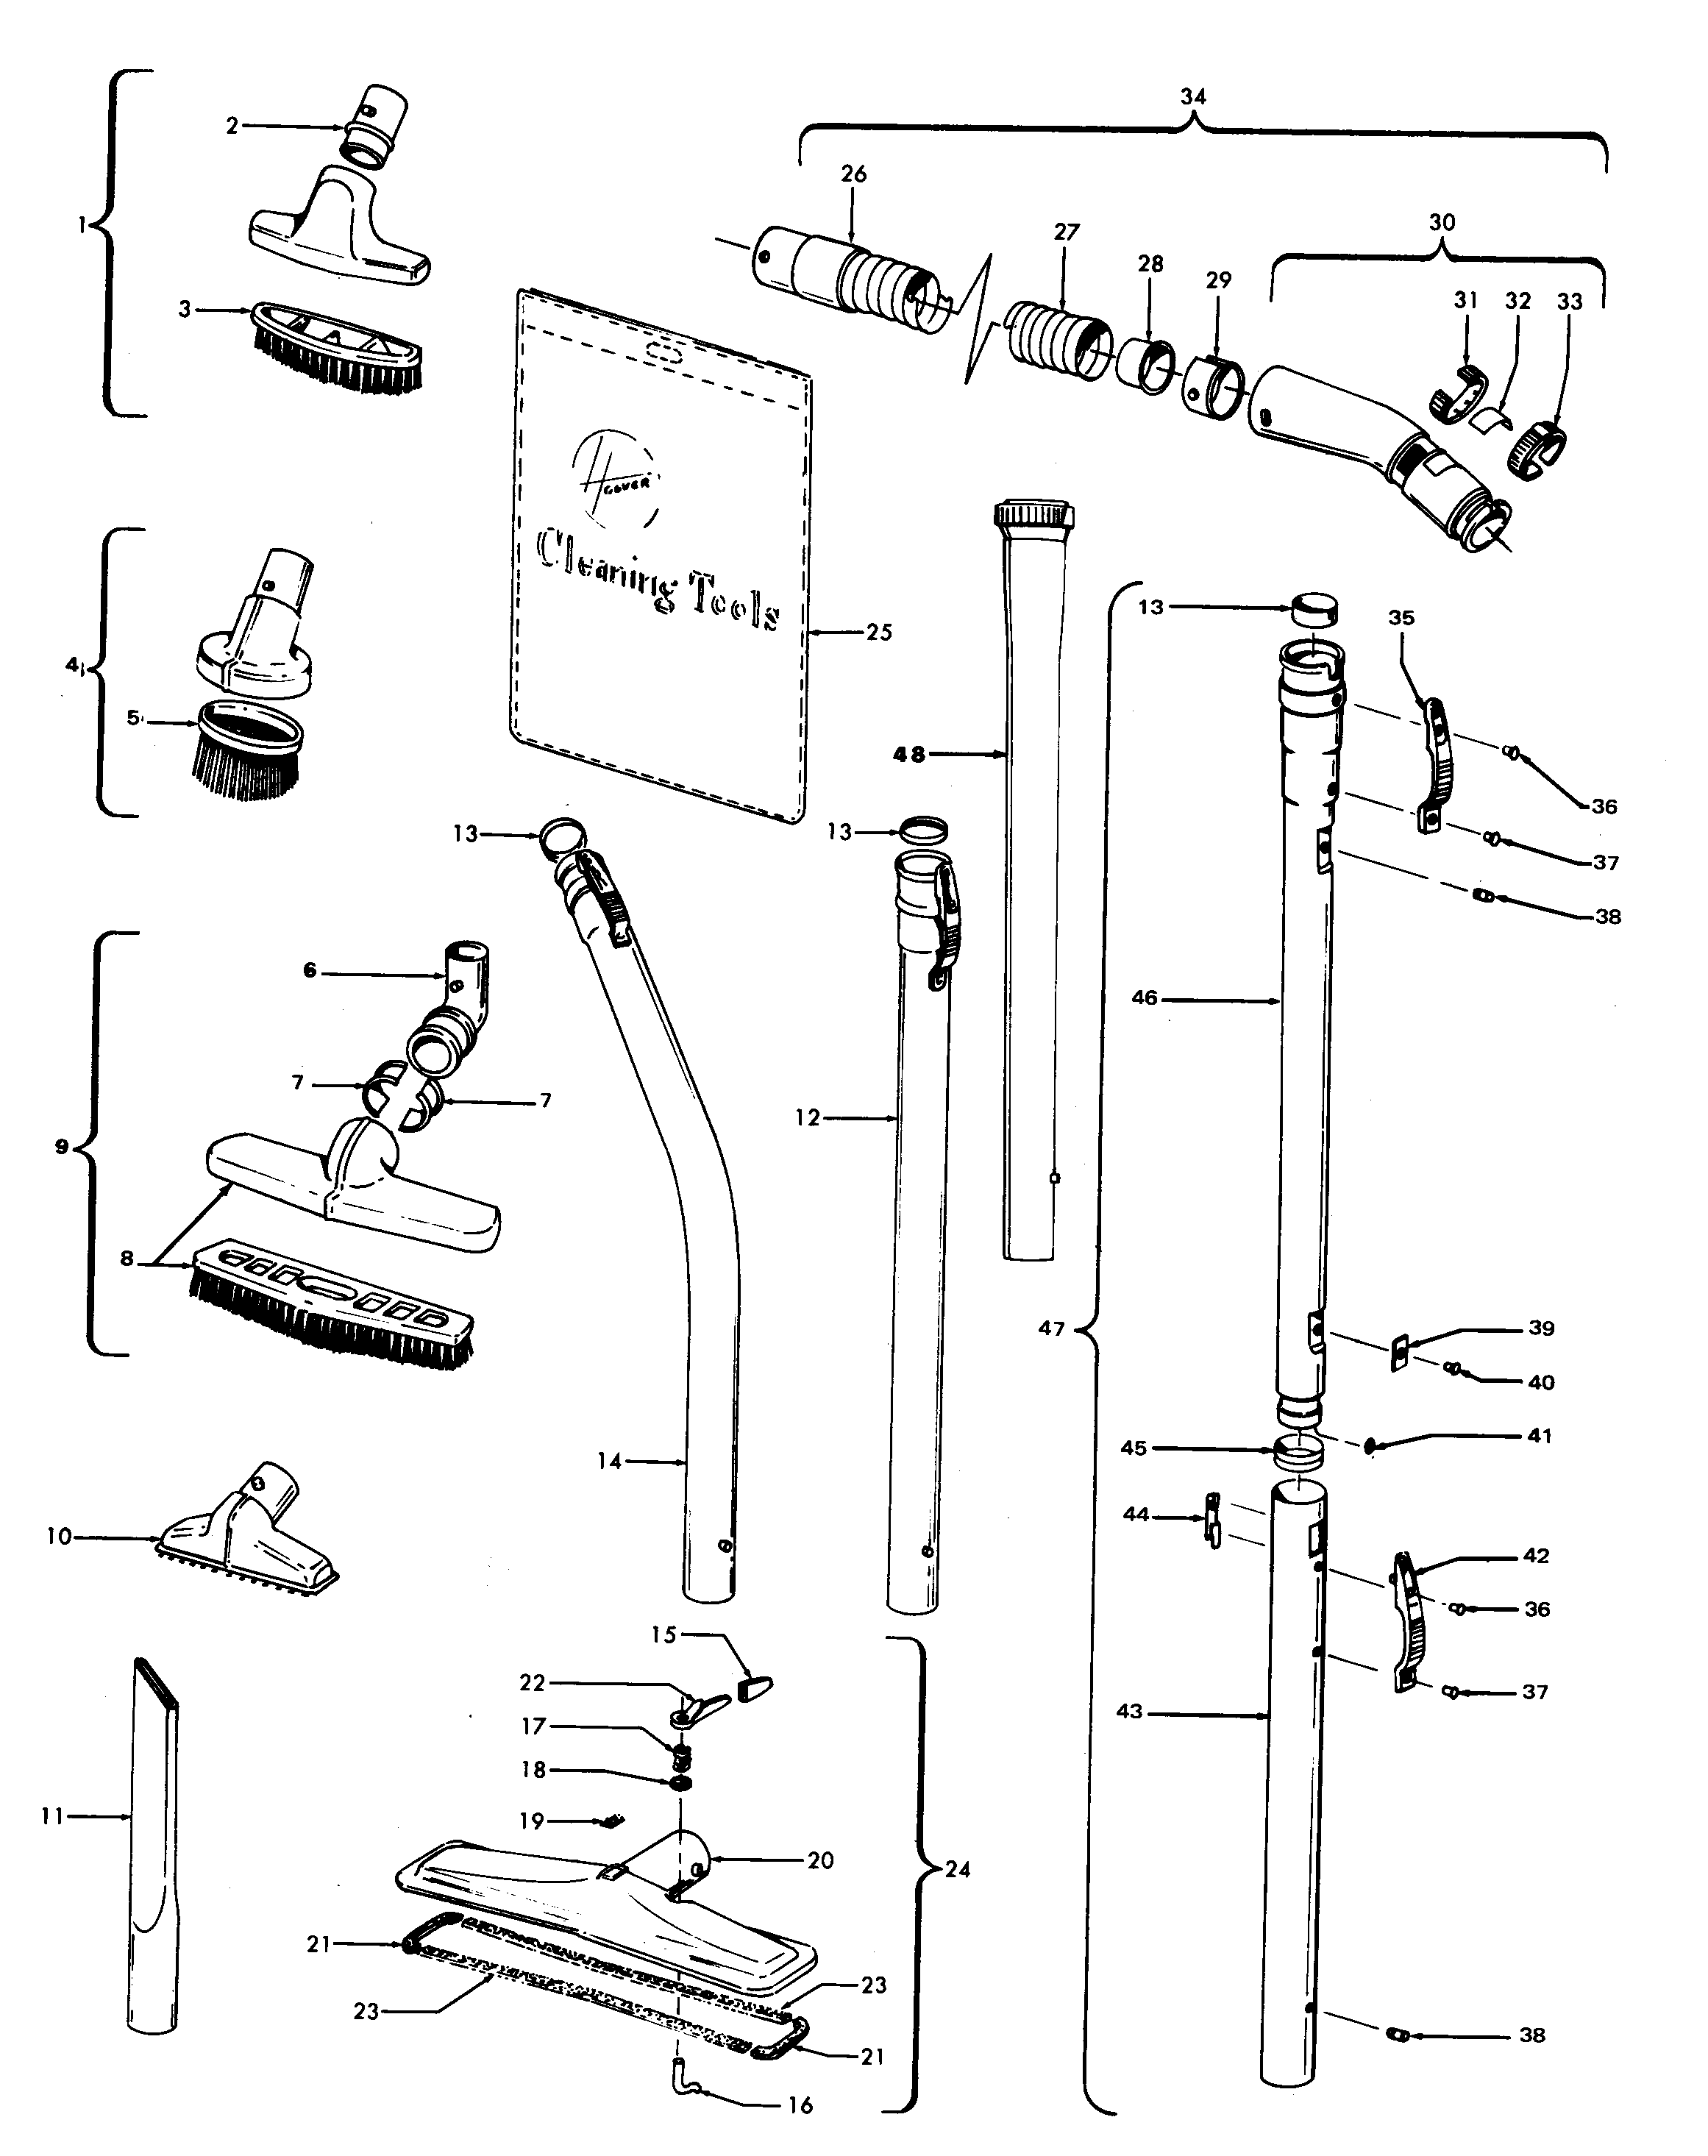 Hoover Model 707 Vacuum Upright Genuine Parts Wiring Diagram